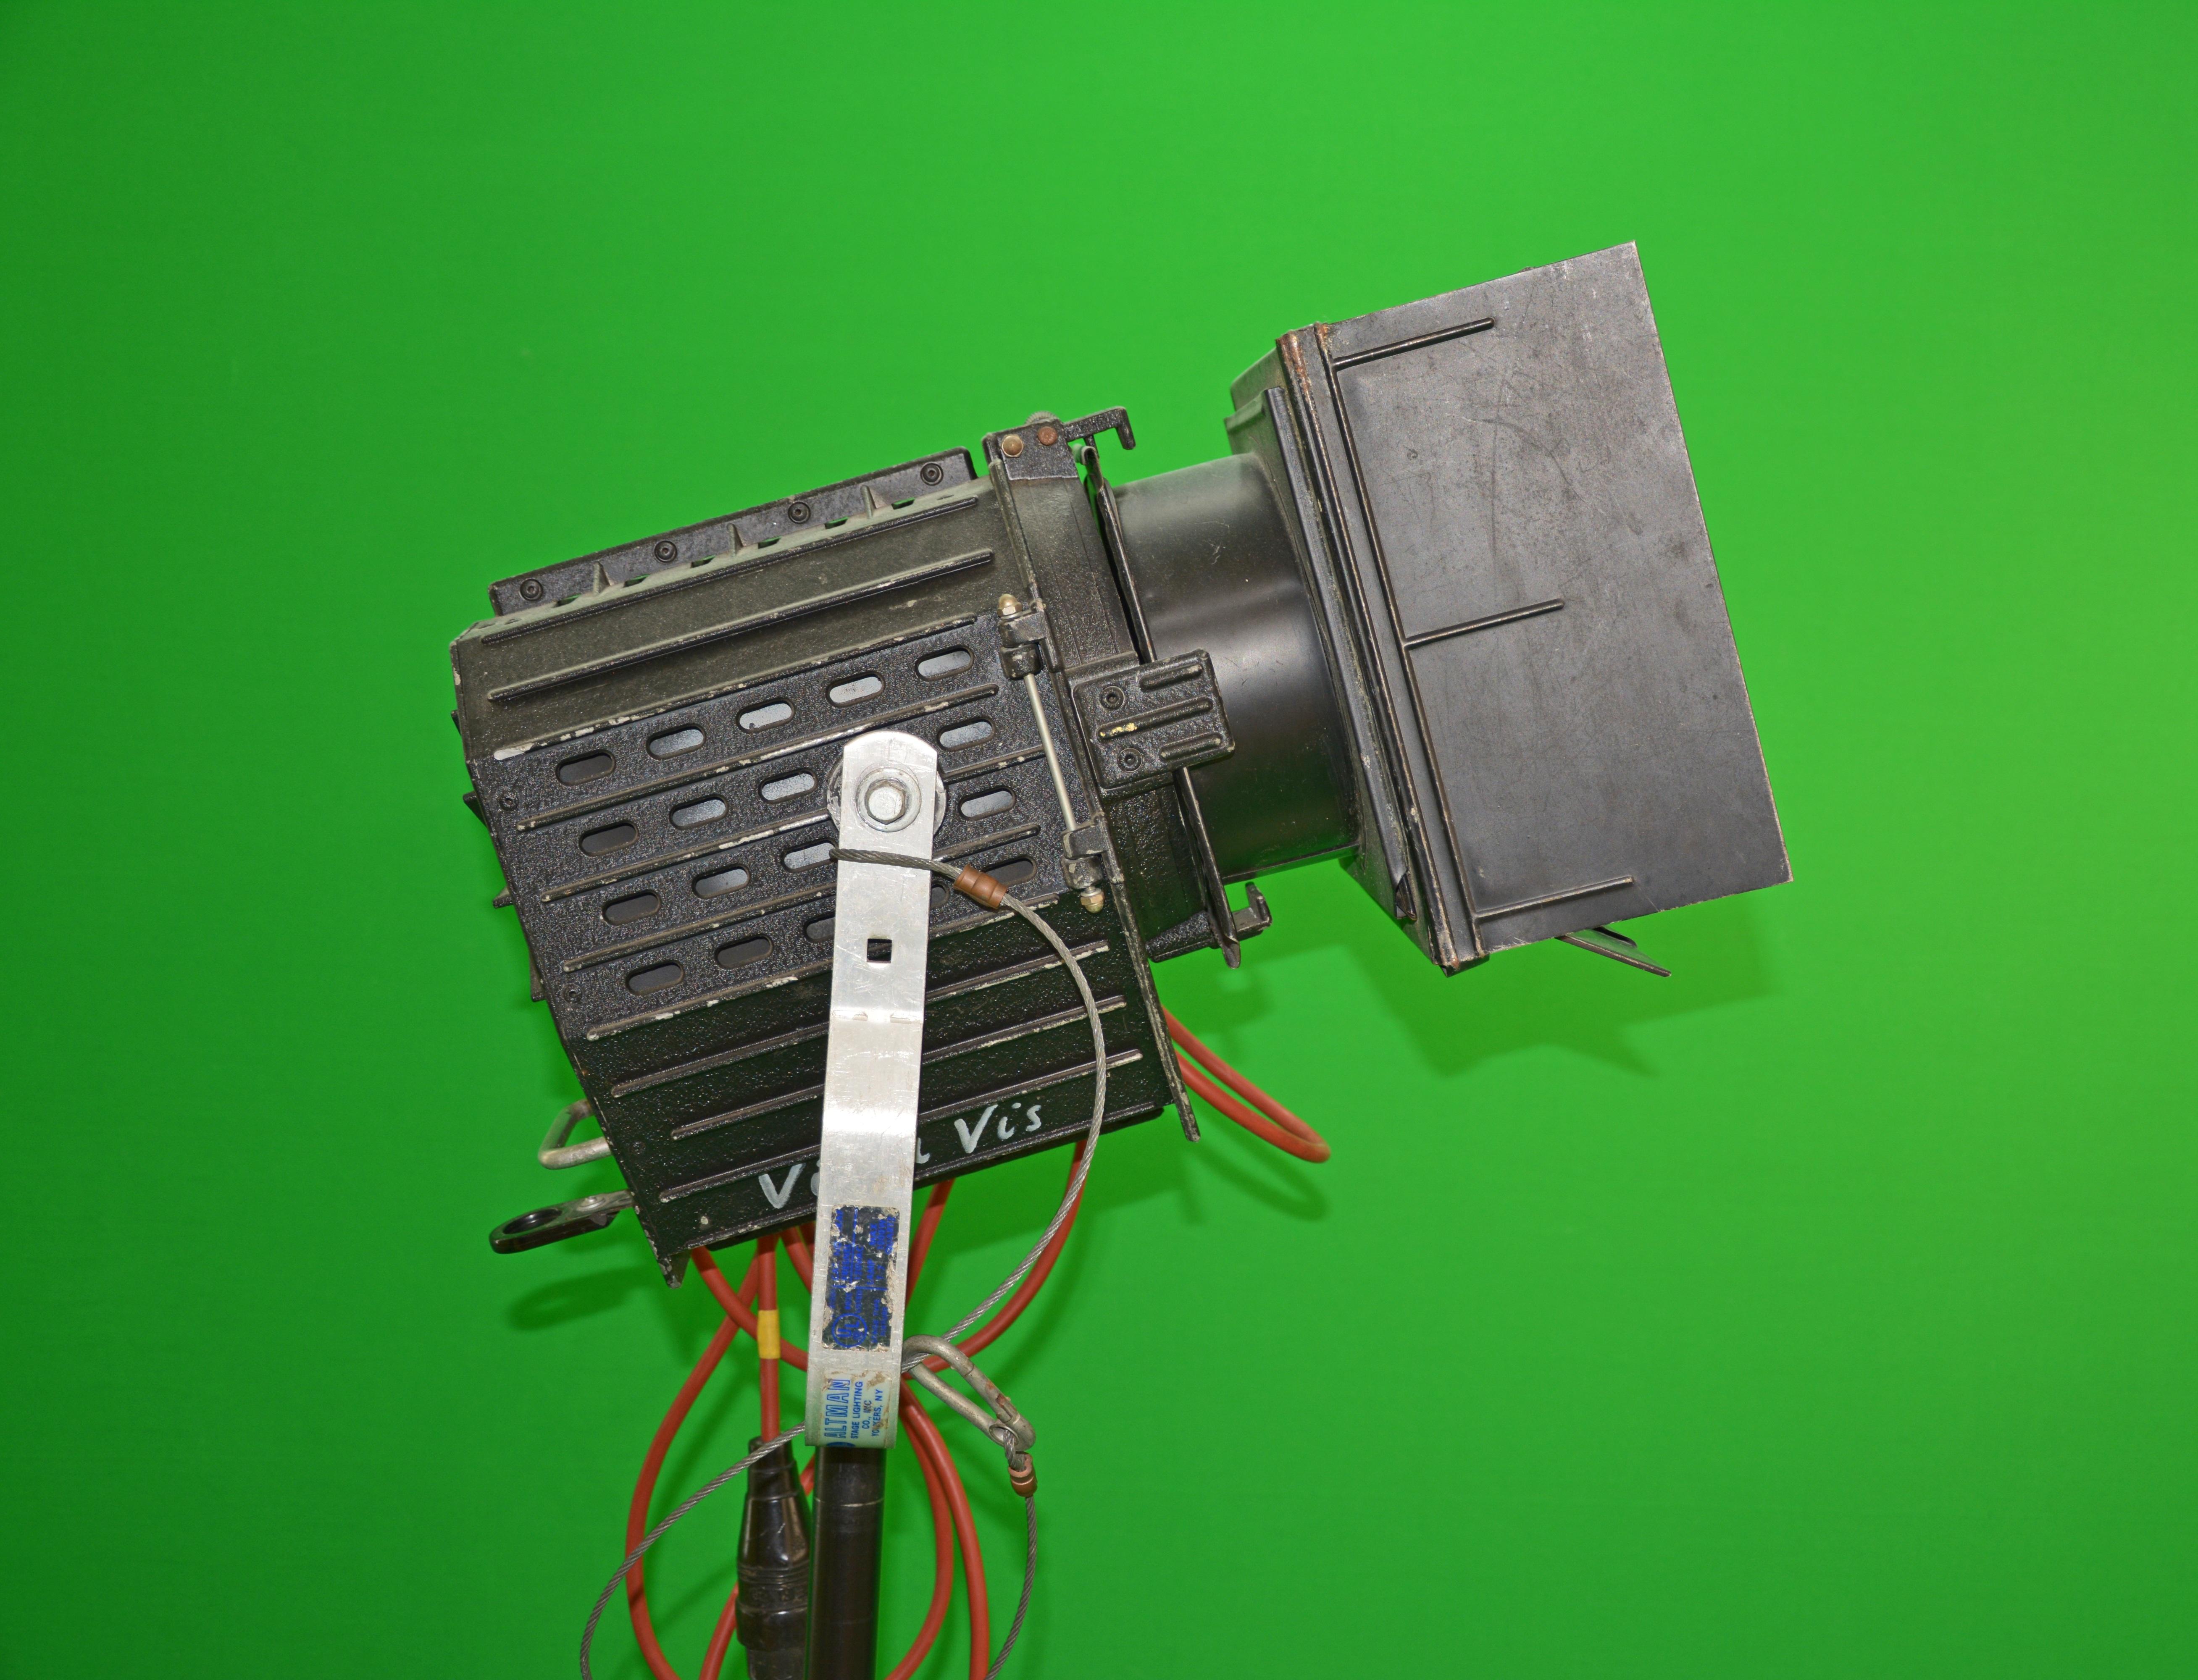 free images light technology green studio machine laser rh pxhere com